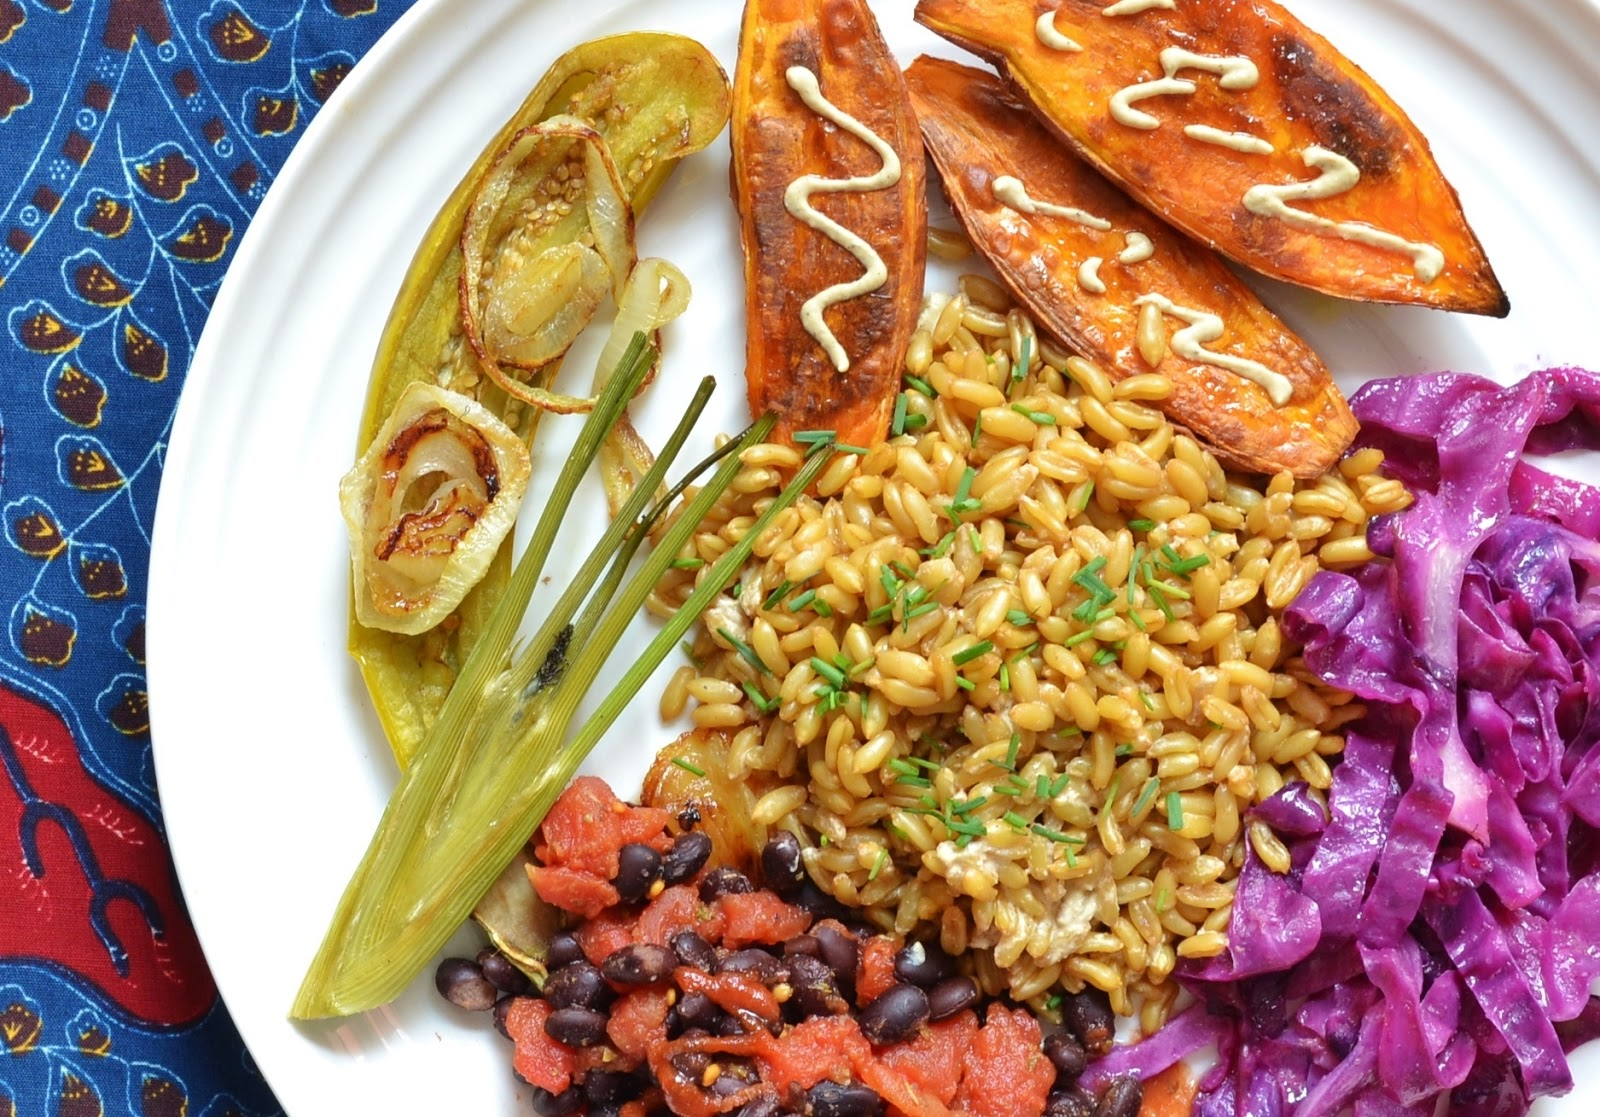 Easy whole food vegan recipes top home recipes 2018 easy whole food vegan recipes forumfinder Gallery